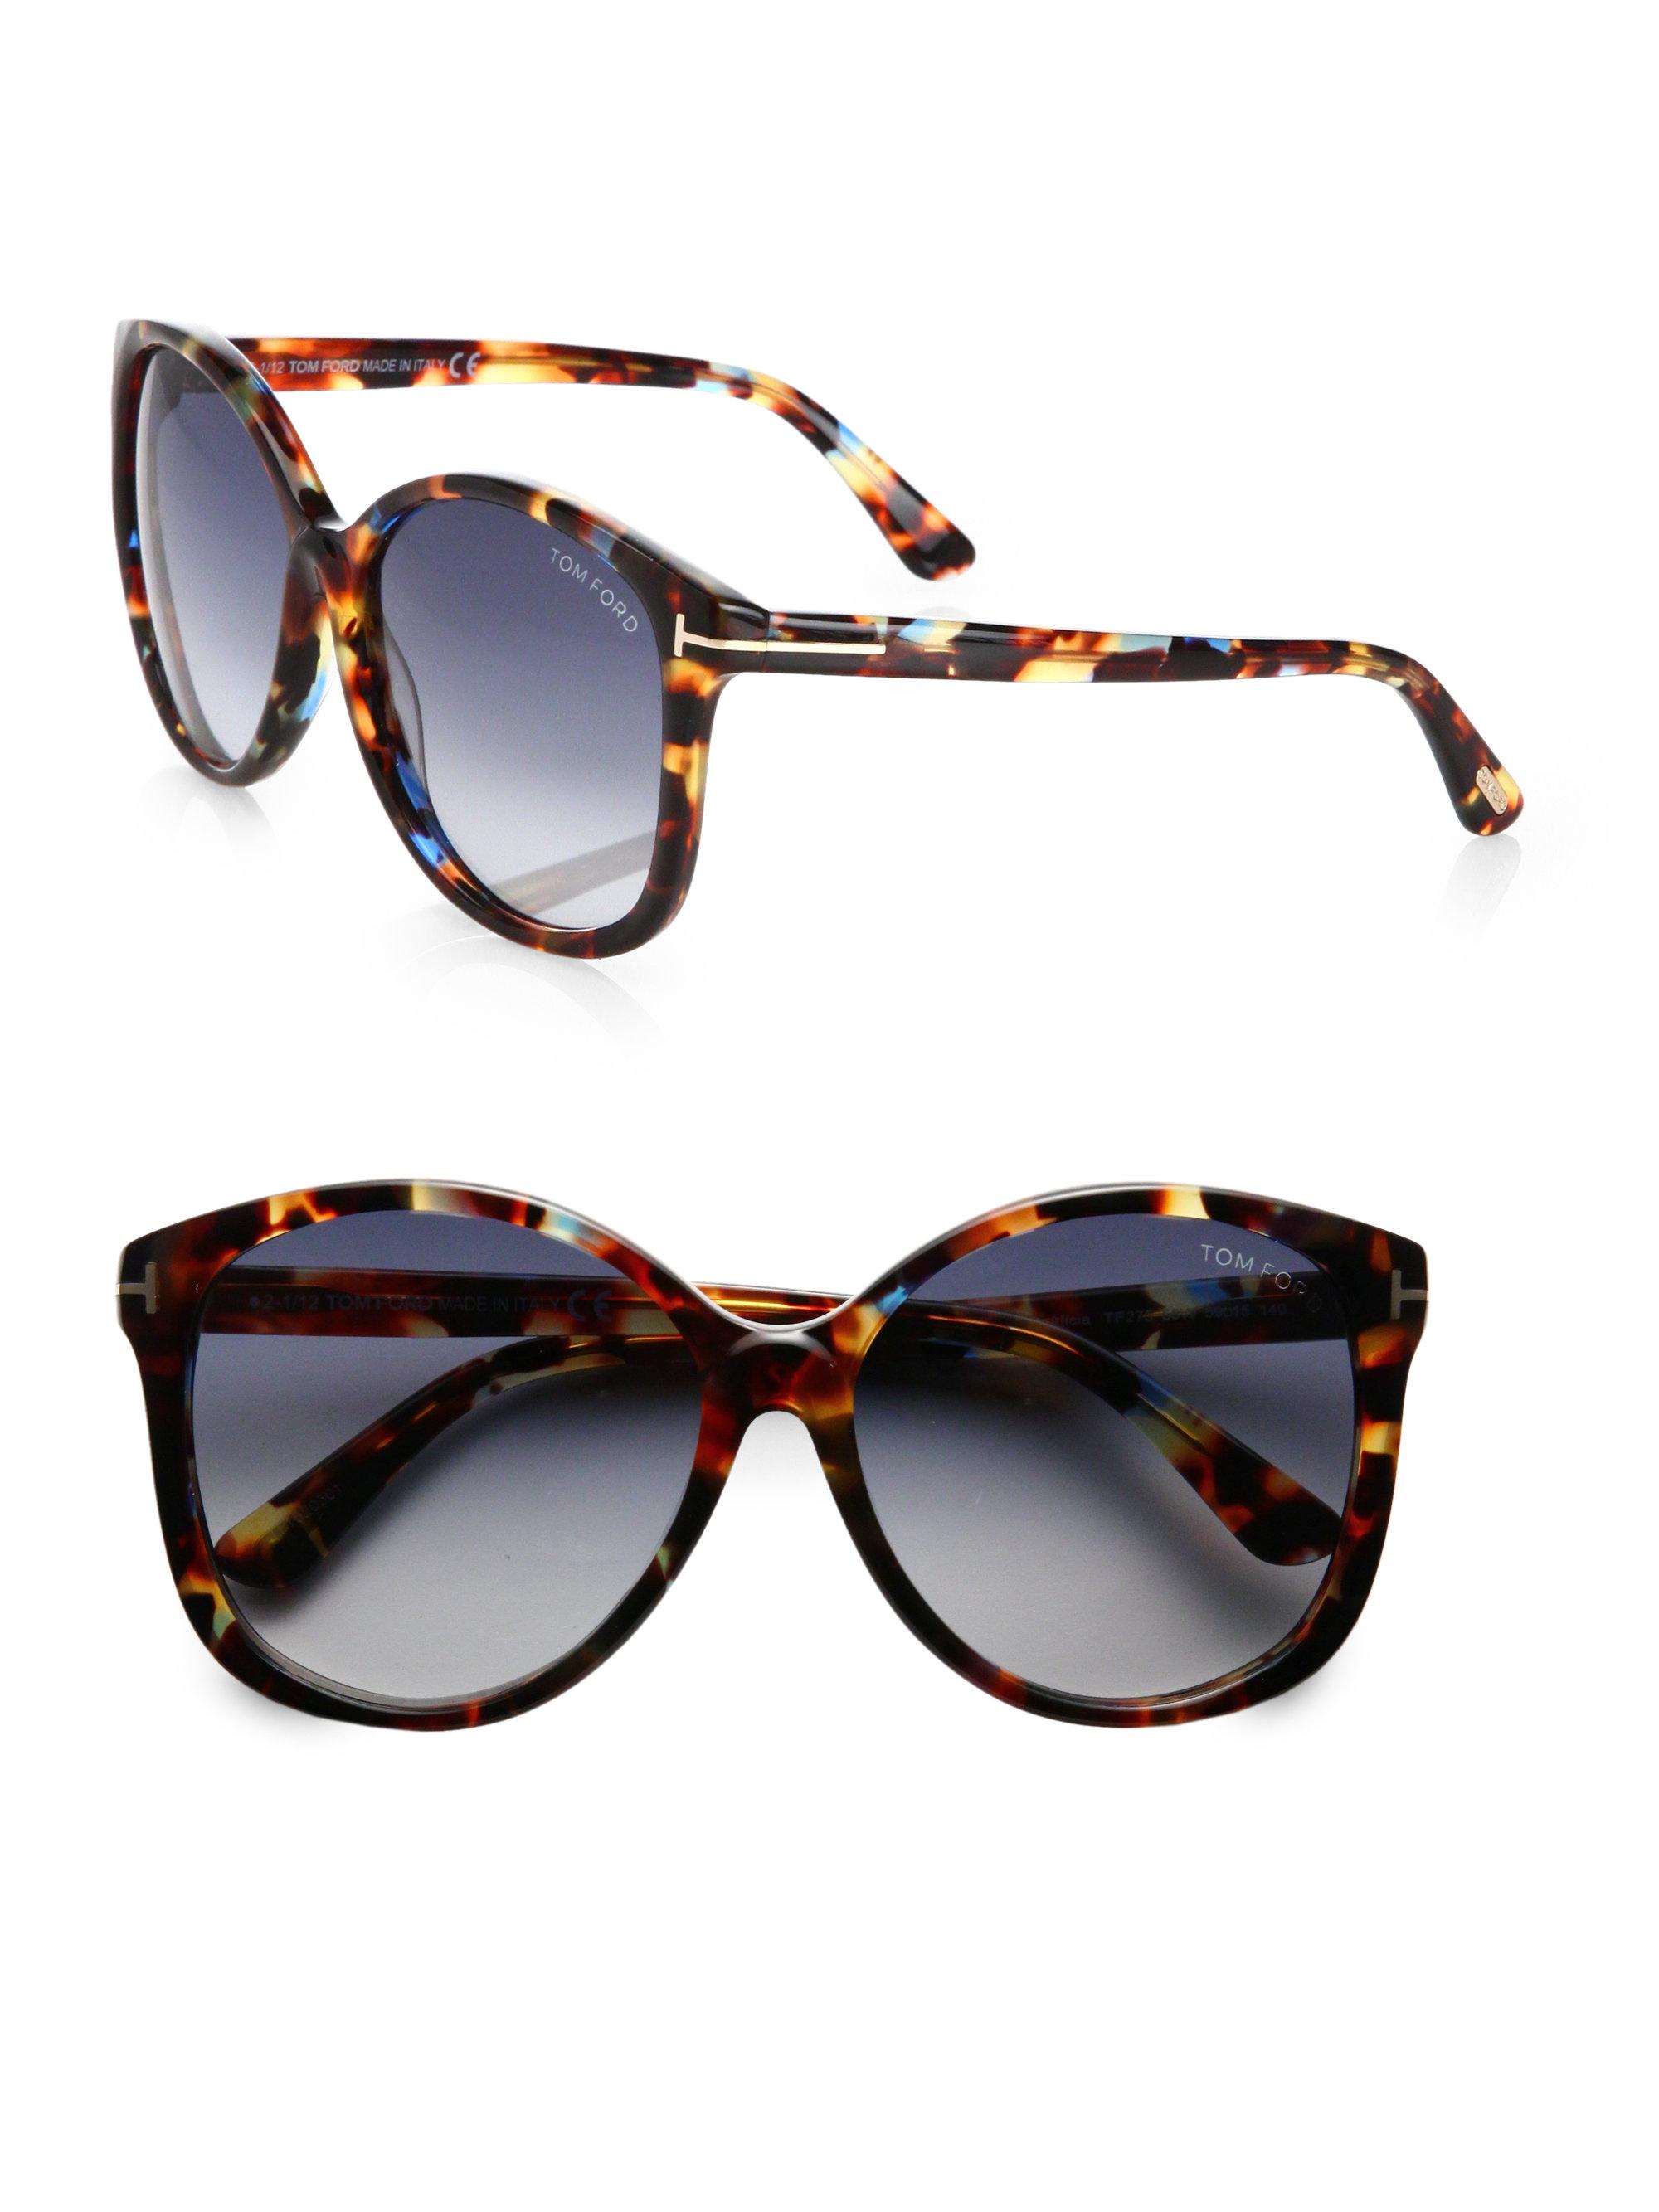 8cc6f09364c Tom ford Alicia Round Acetate Sunglasses in Brown